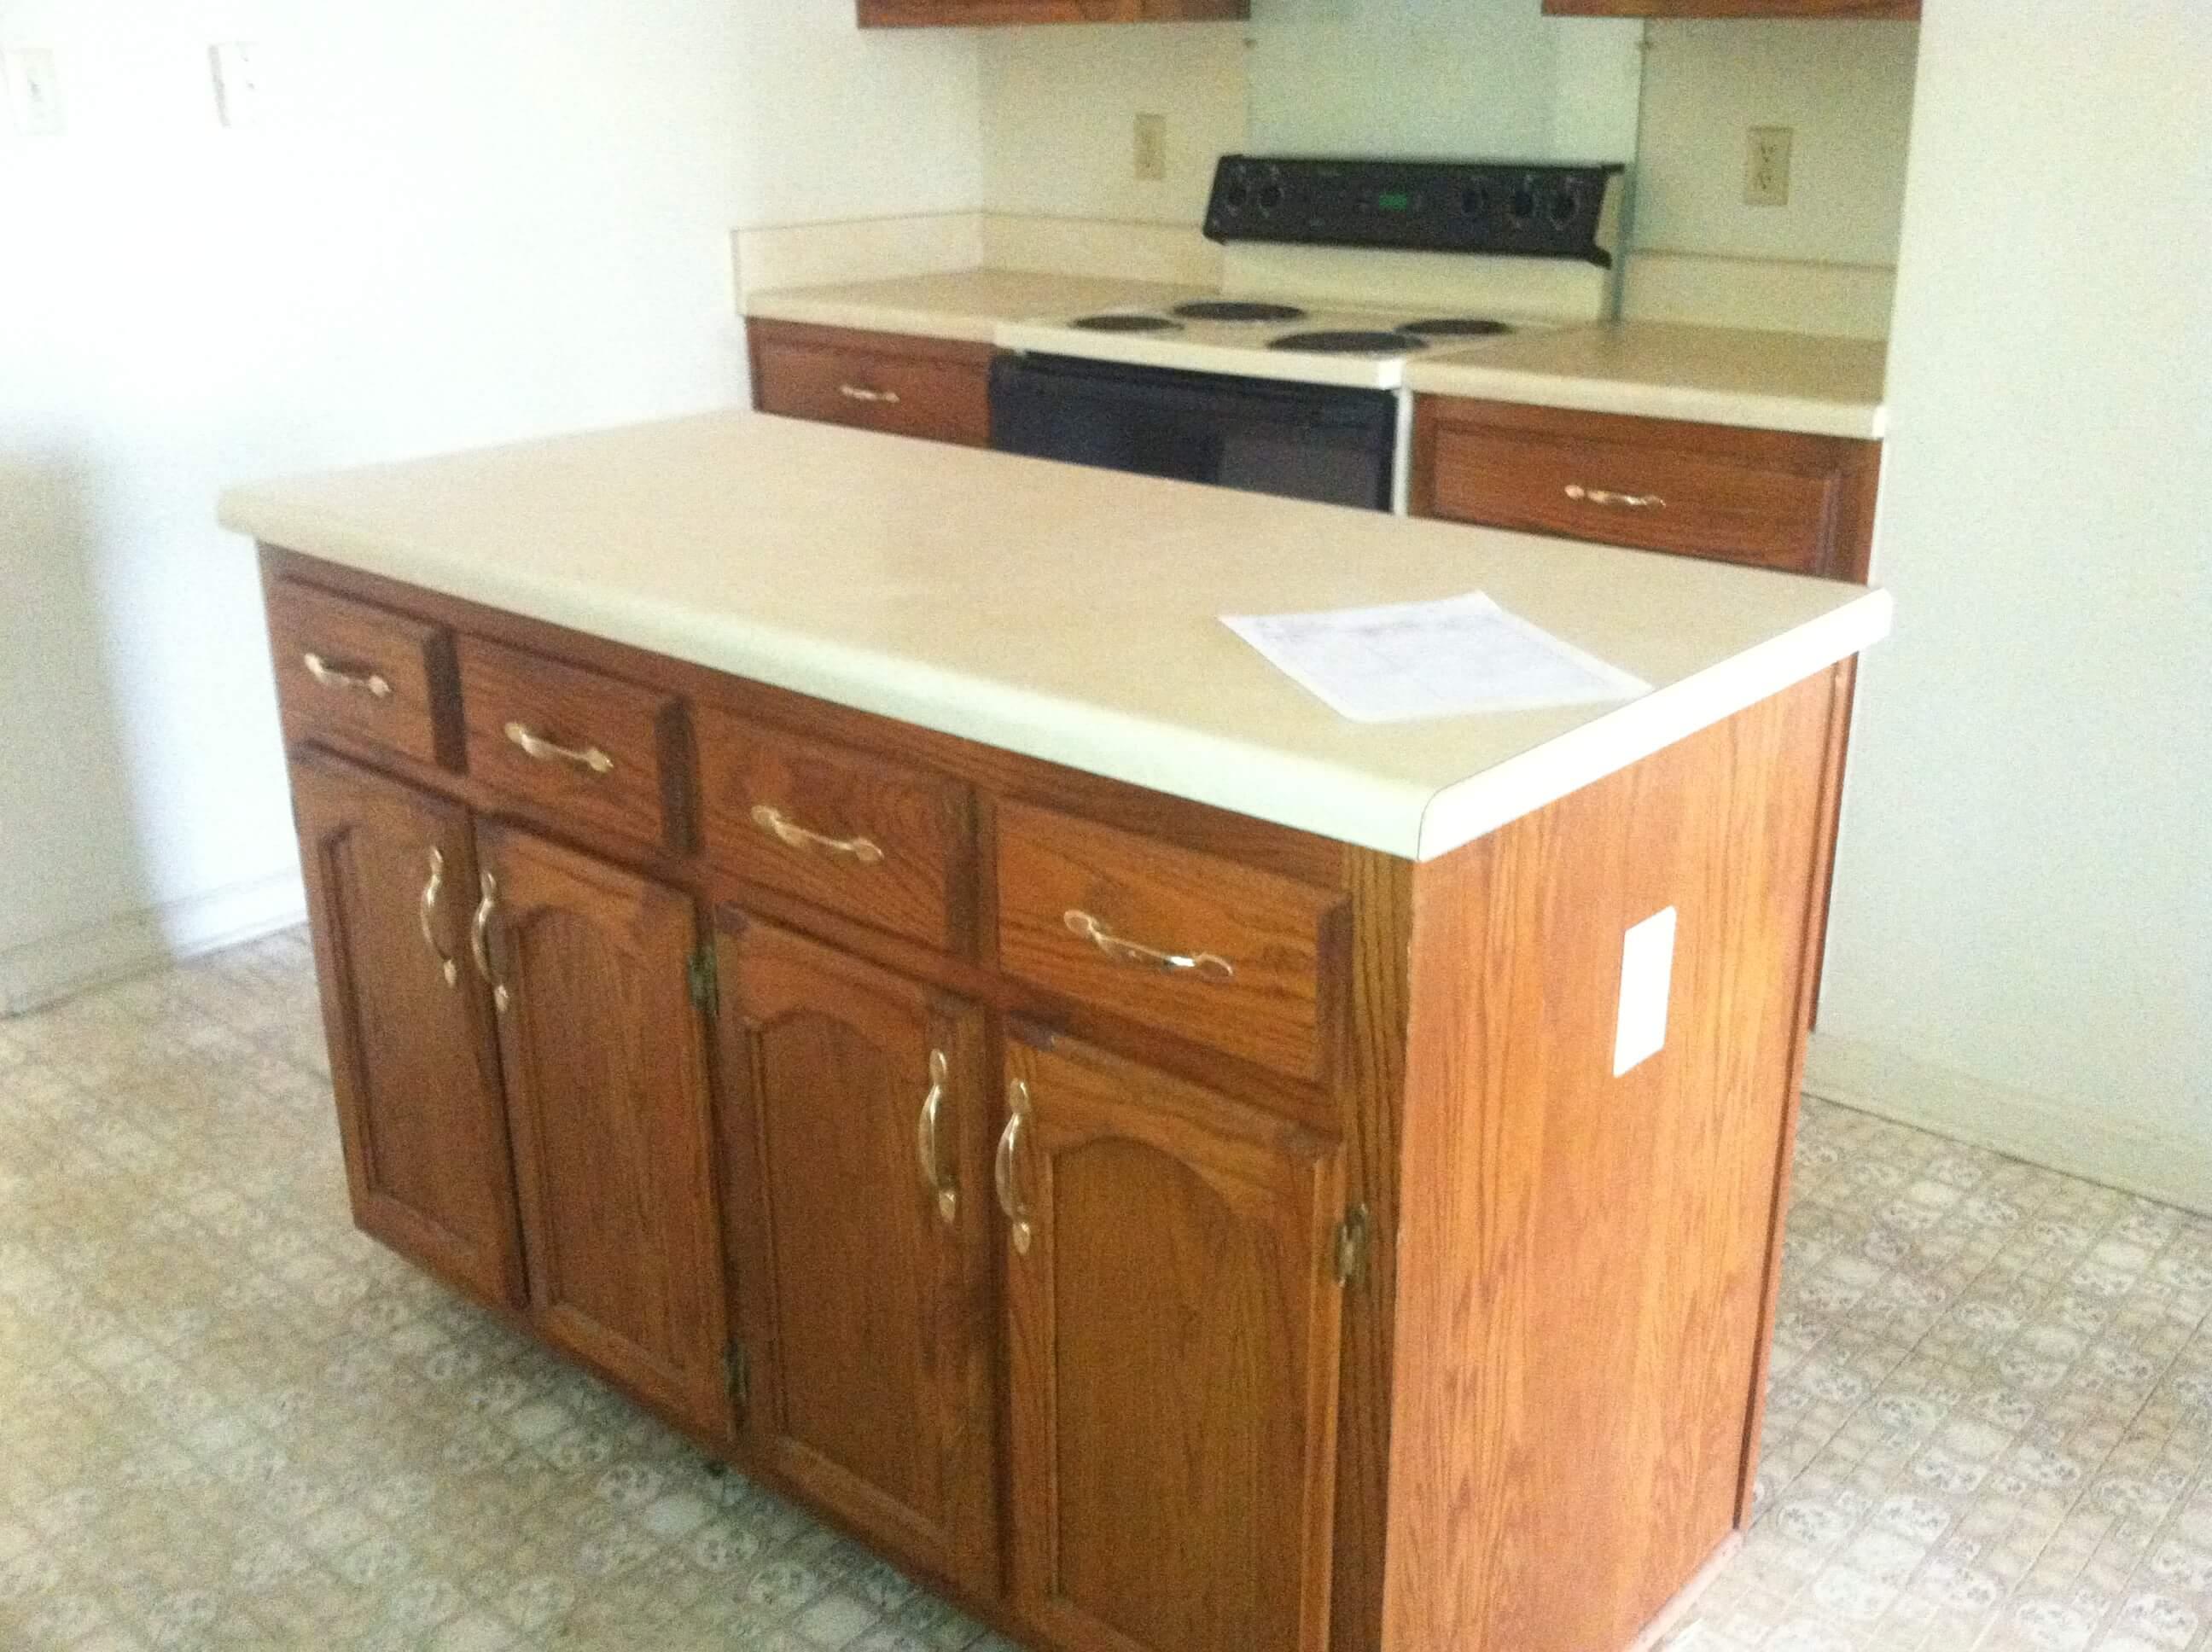 Kitchen-Remodel Rustoleum Cabinet Transformations